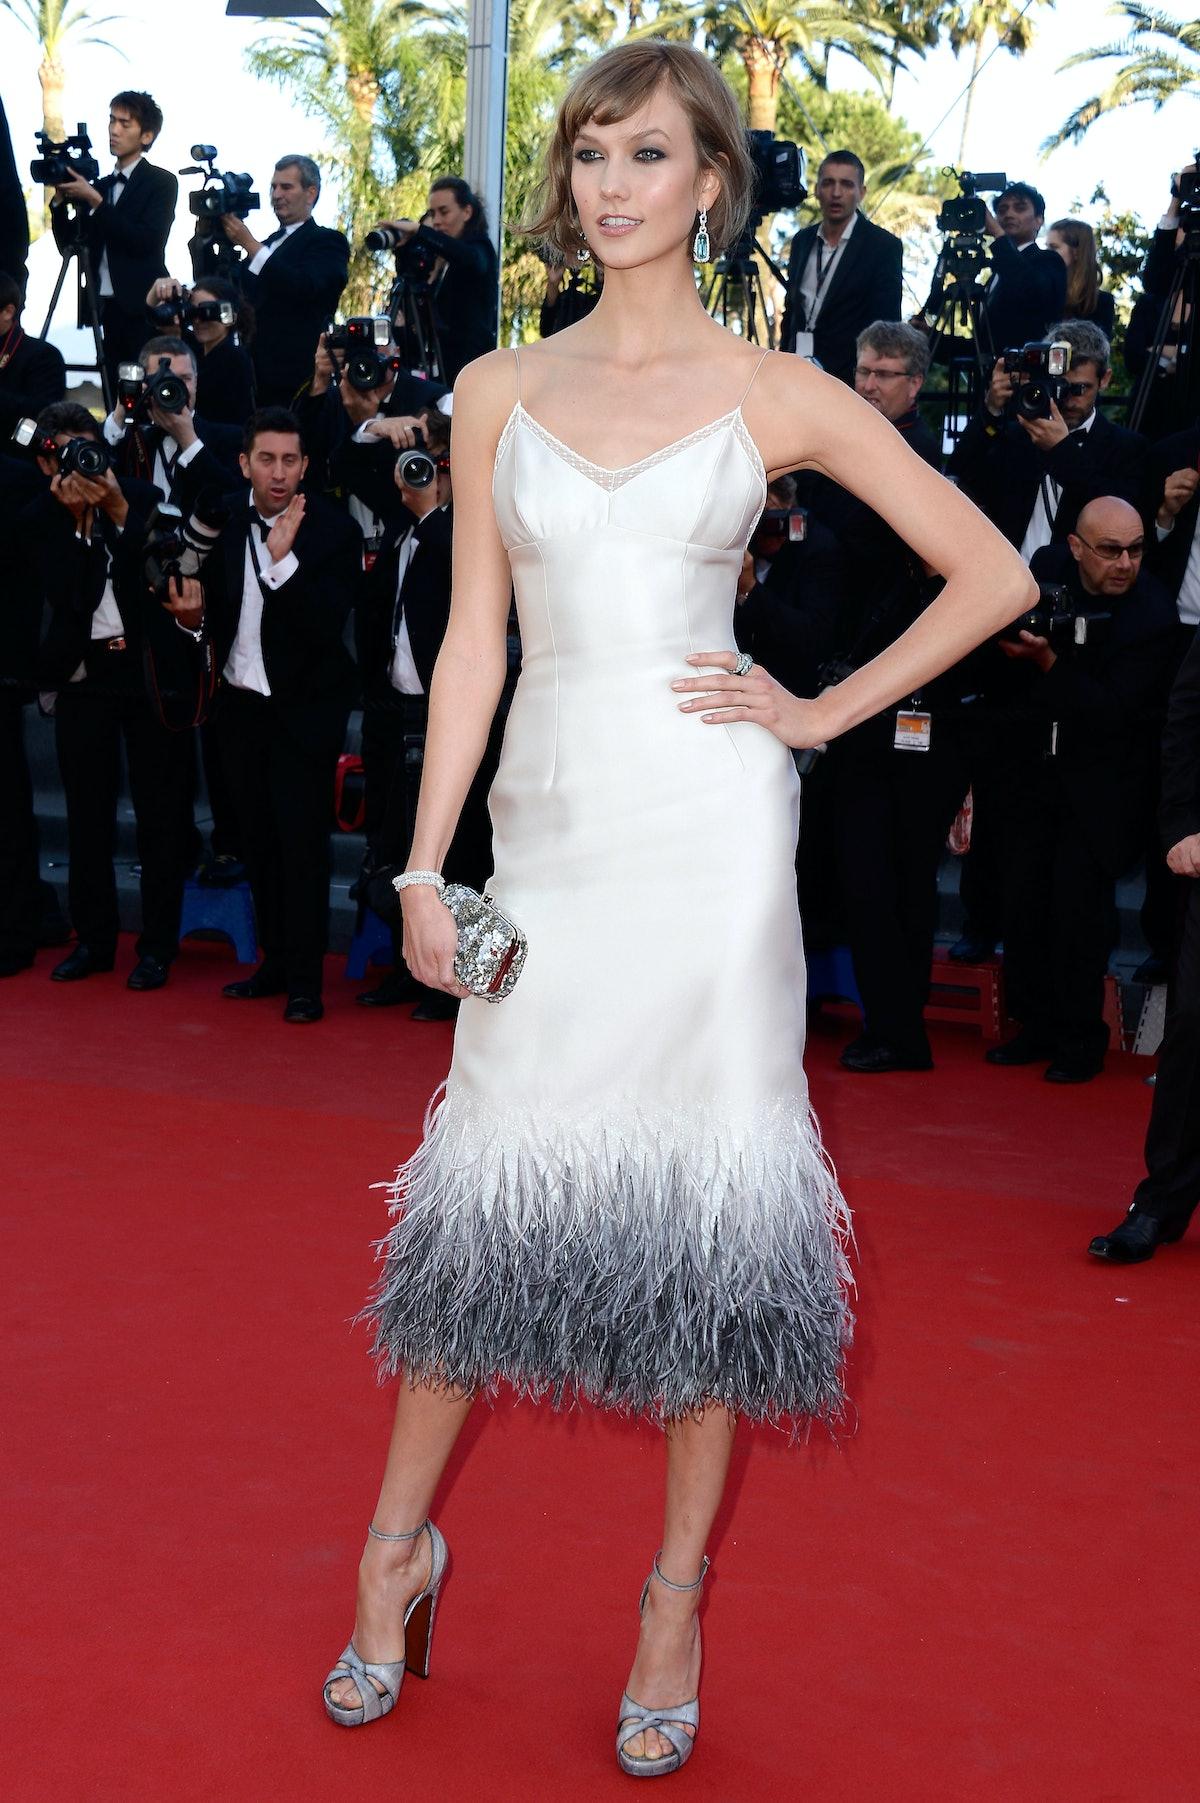 'The Immigrant' Premiere - The 66th Annual Cannes Film Festival